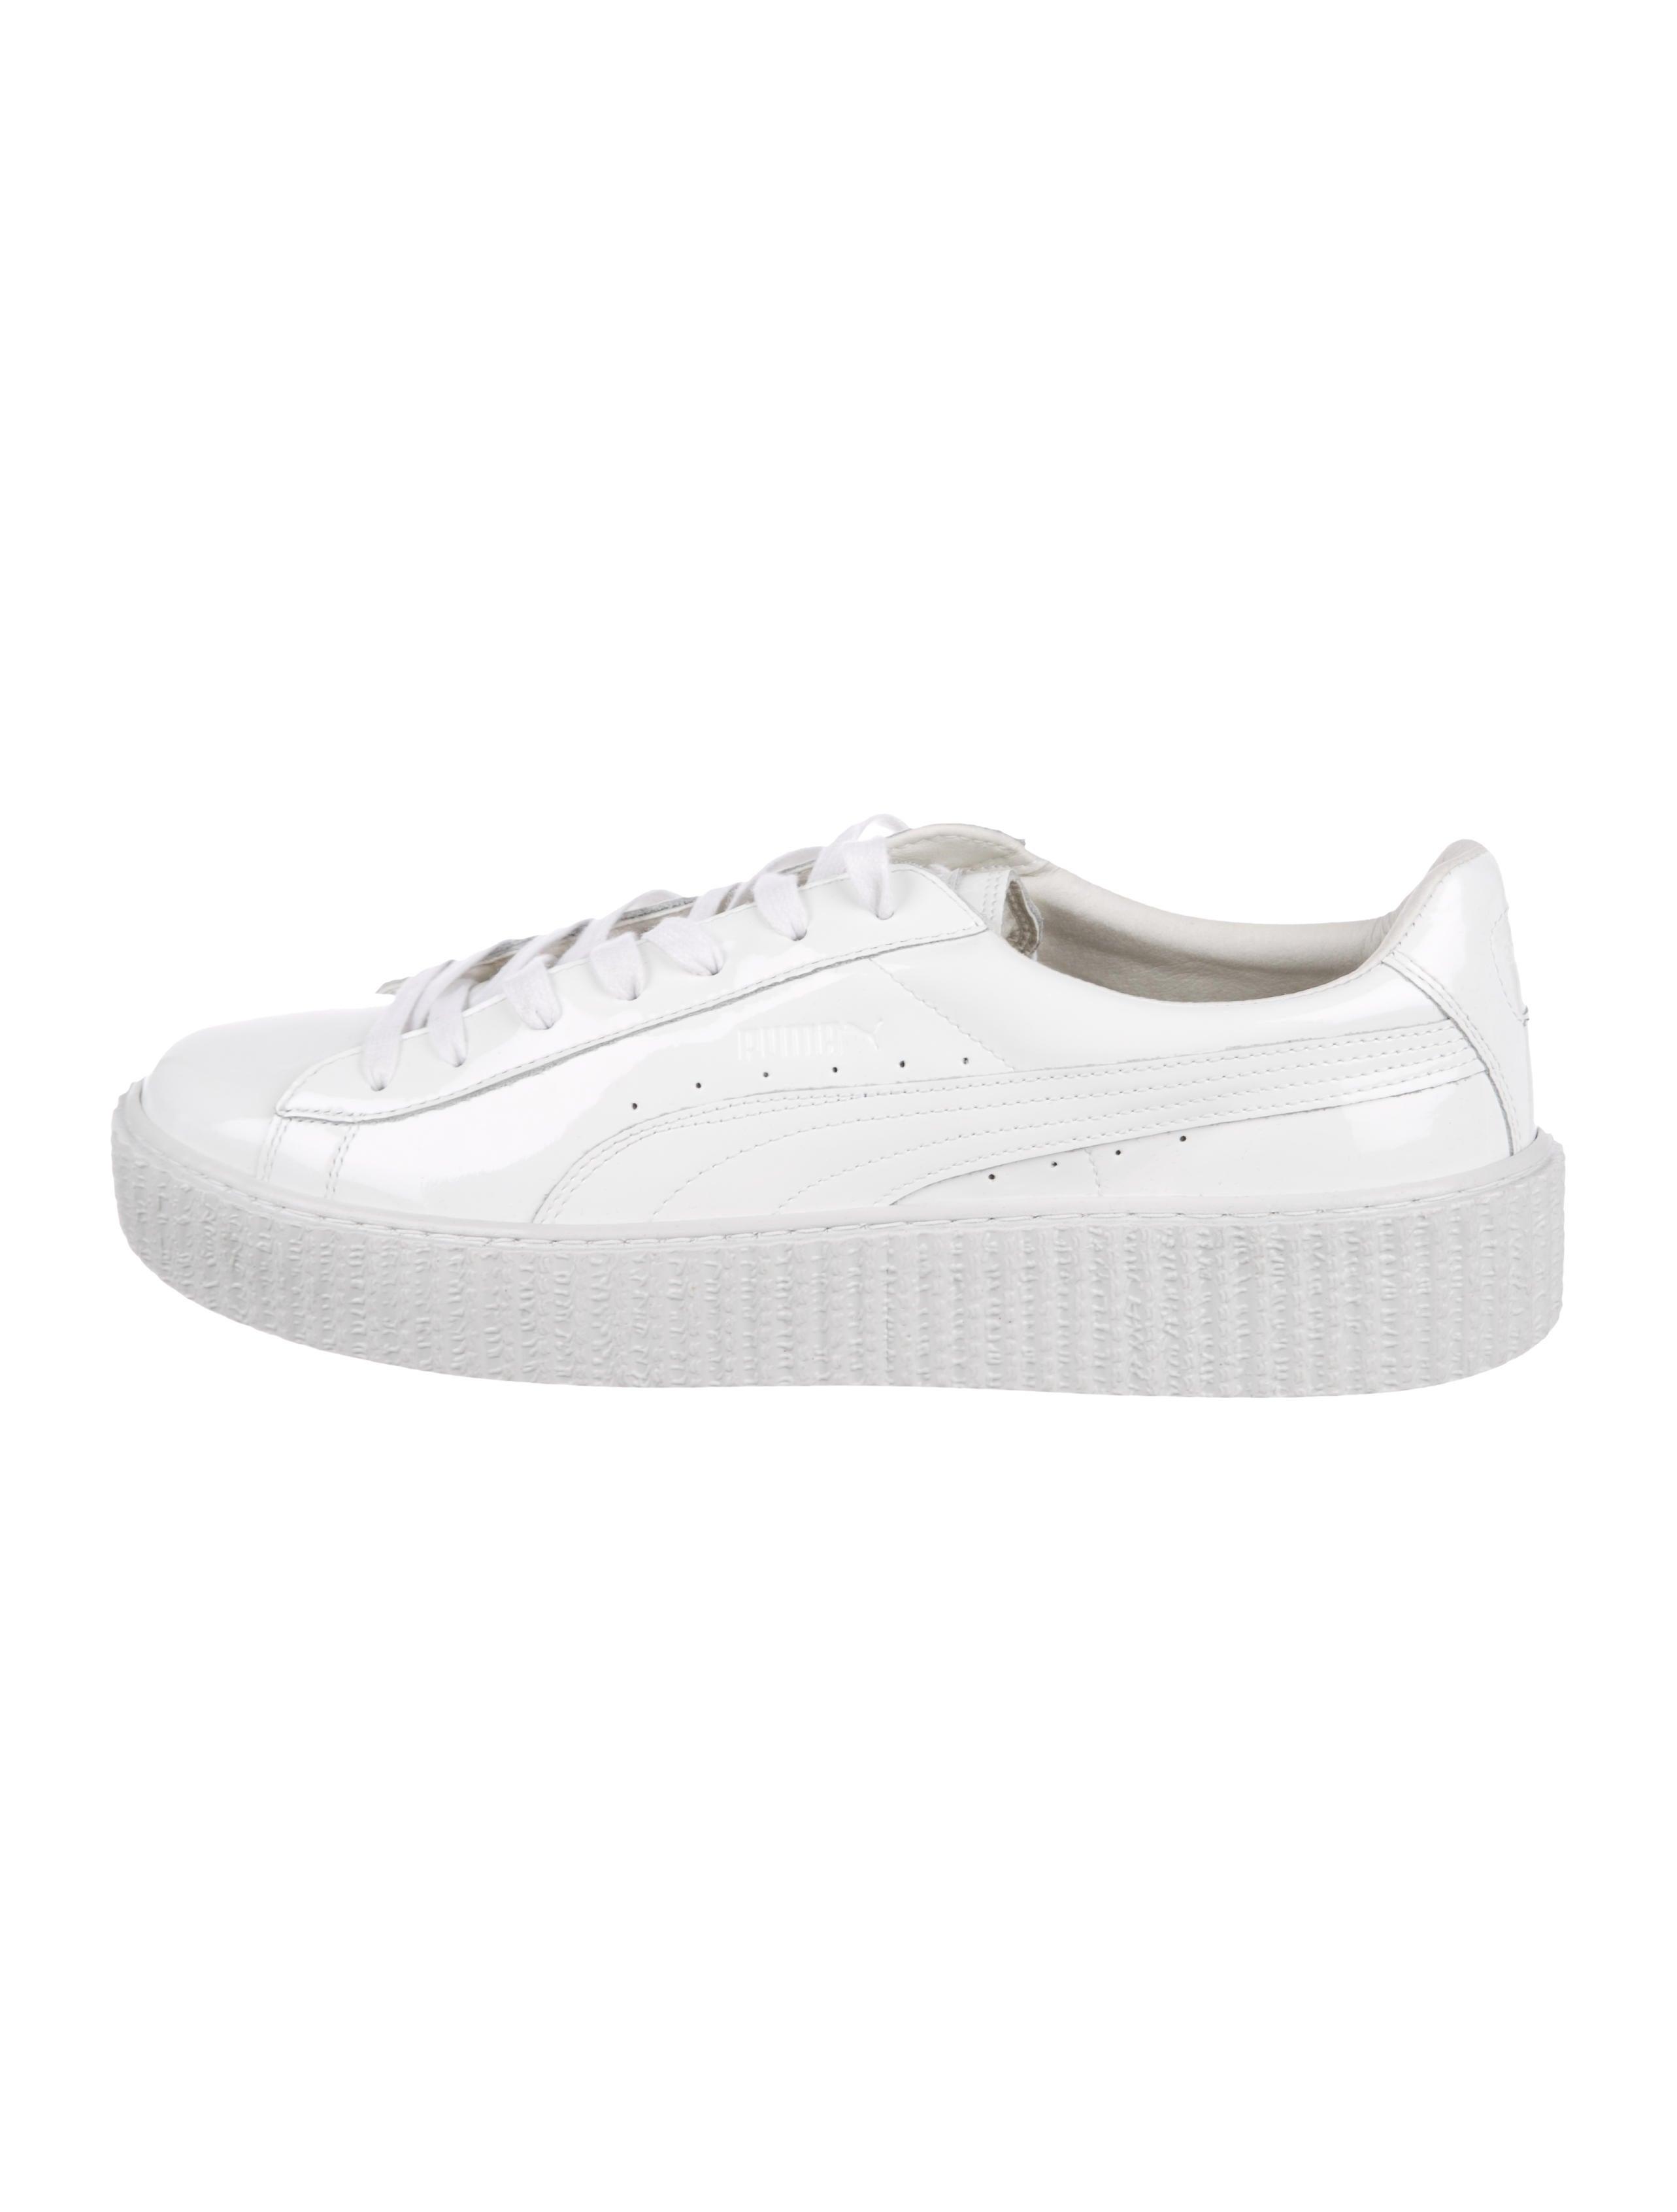 c6d423ff8e5 Fenty x Puma Basket Creepers Sneakers w  Tags - Shoes - WPMFY20742 ...